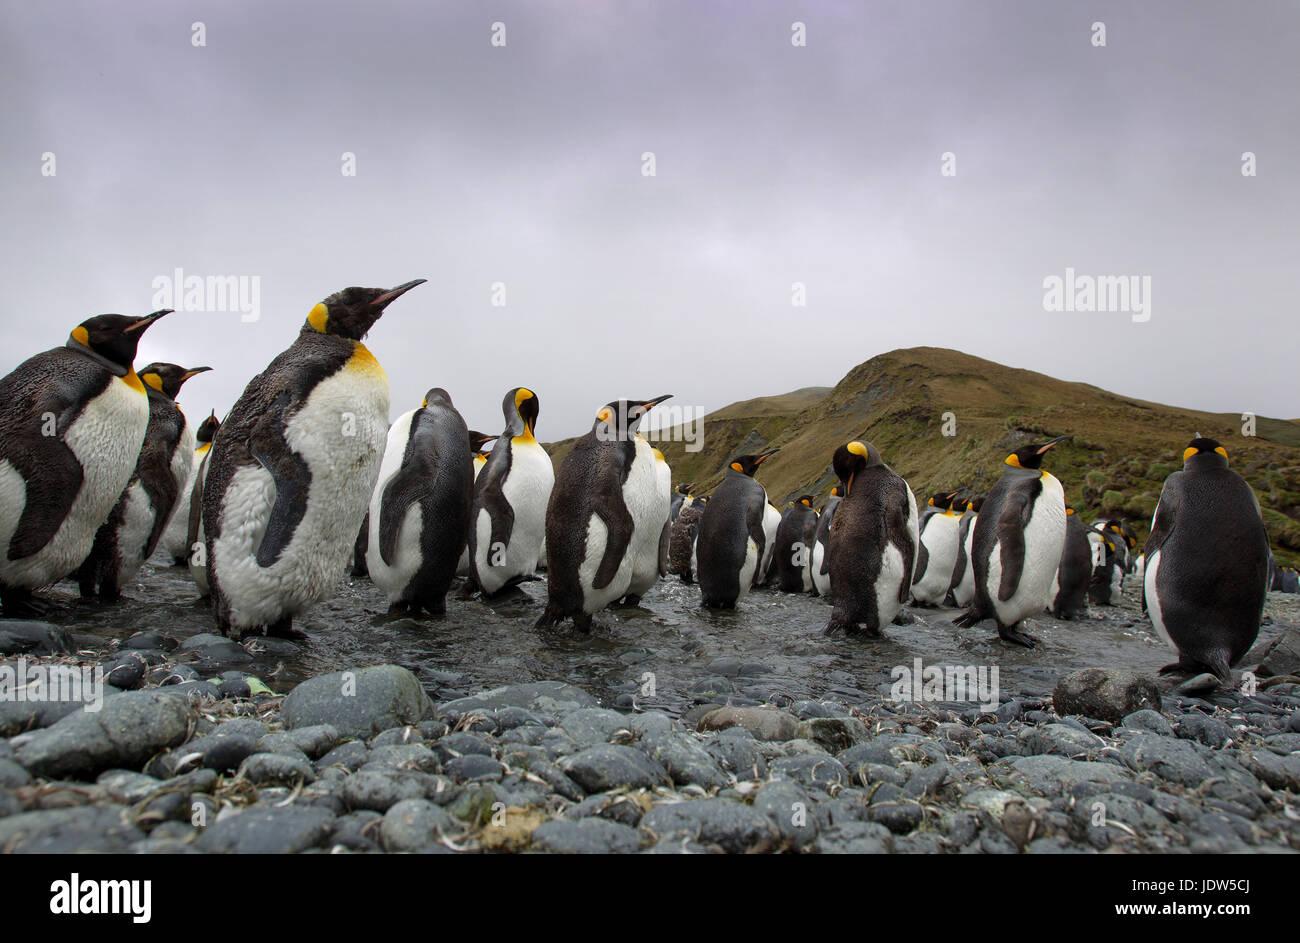 King Penguins, Macquarie Island, Southern Ocean - Stock Image